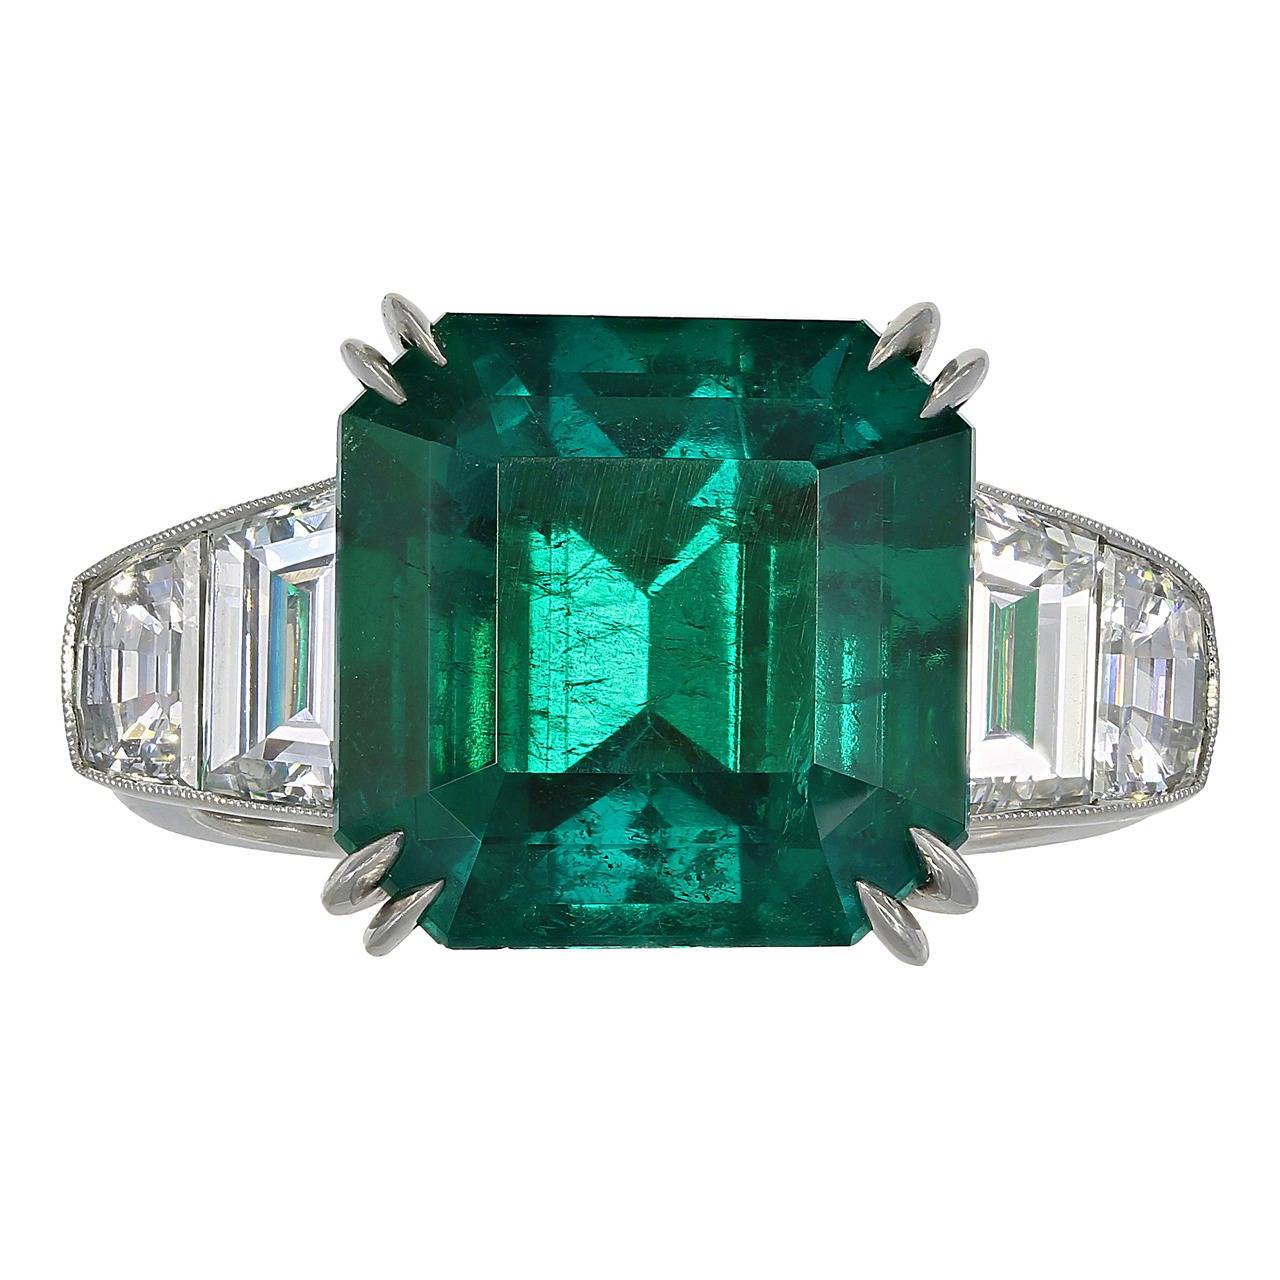 7.28 Carat Colombian Emerald Diamond Ring